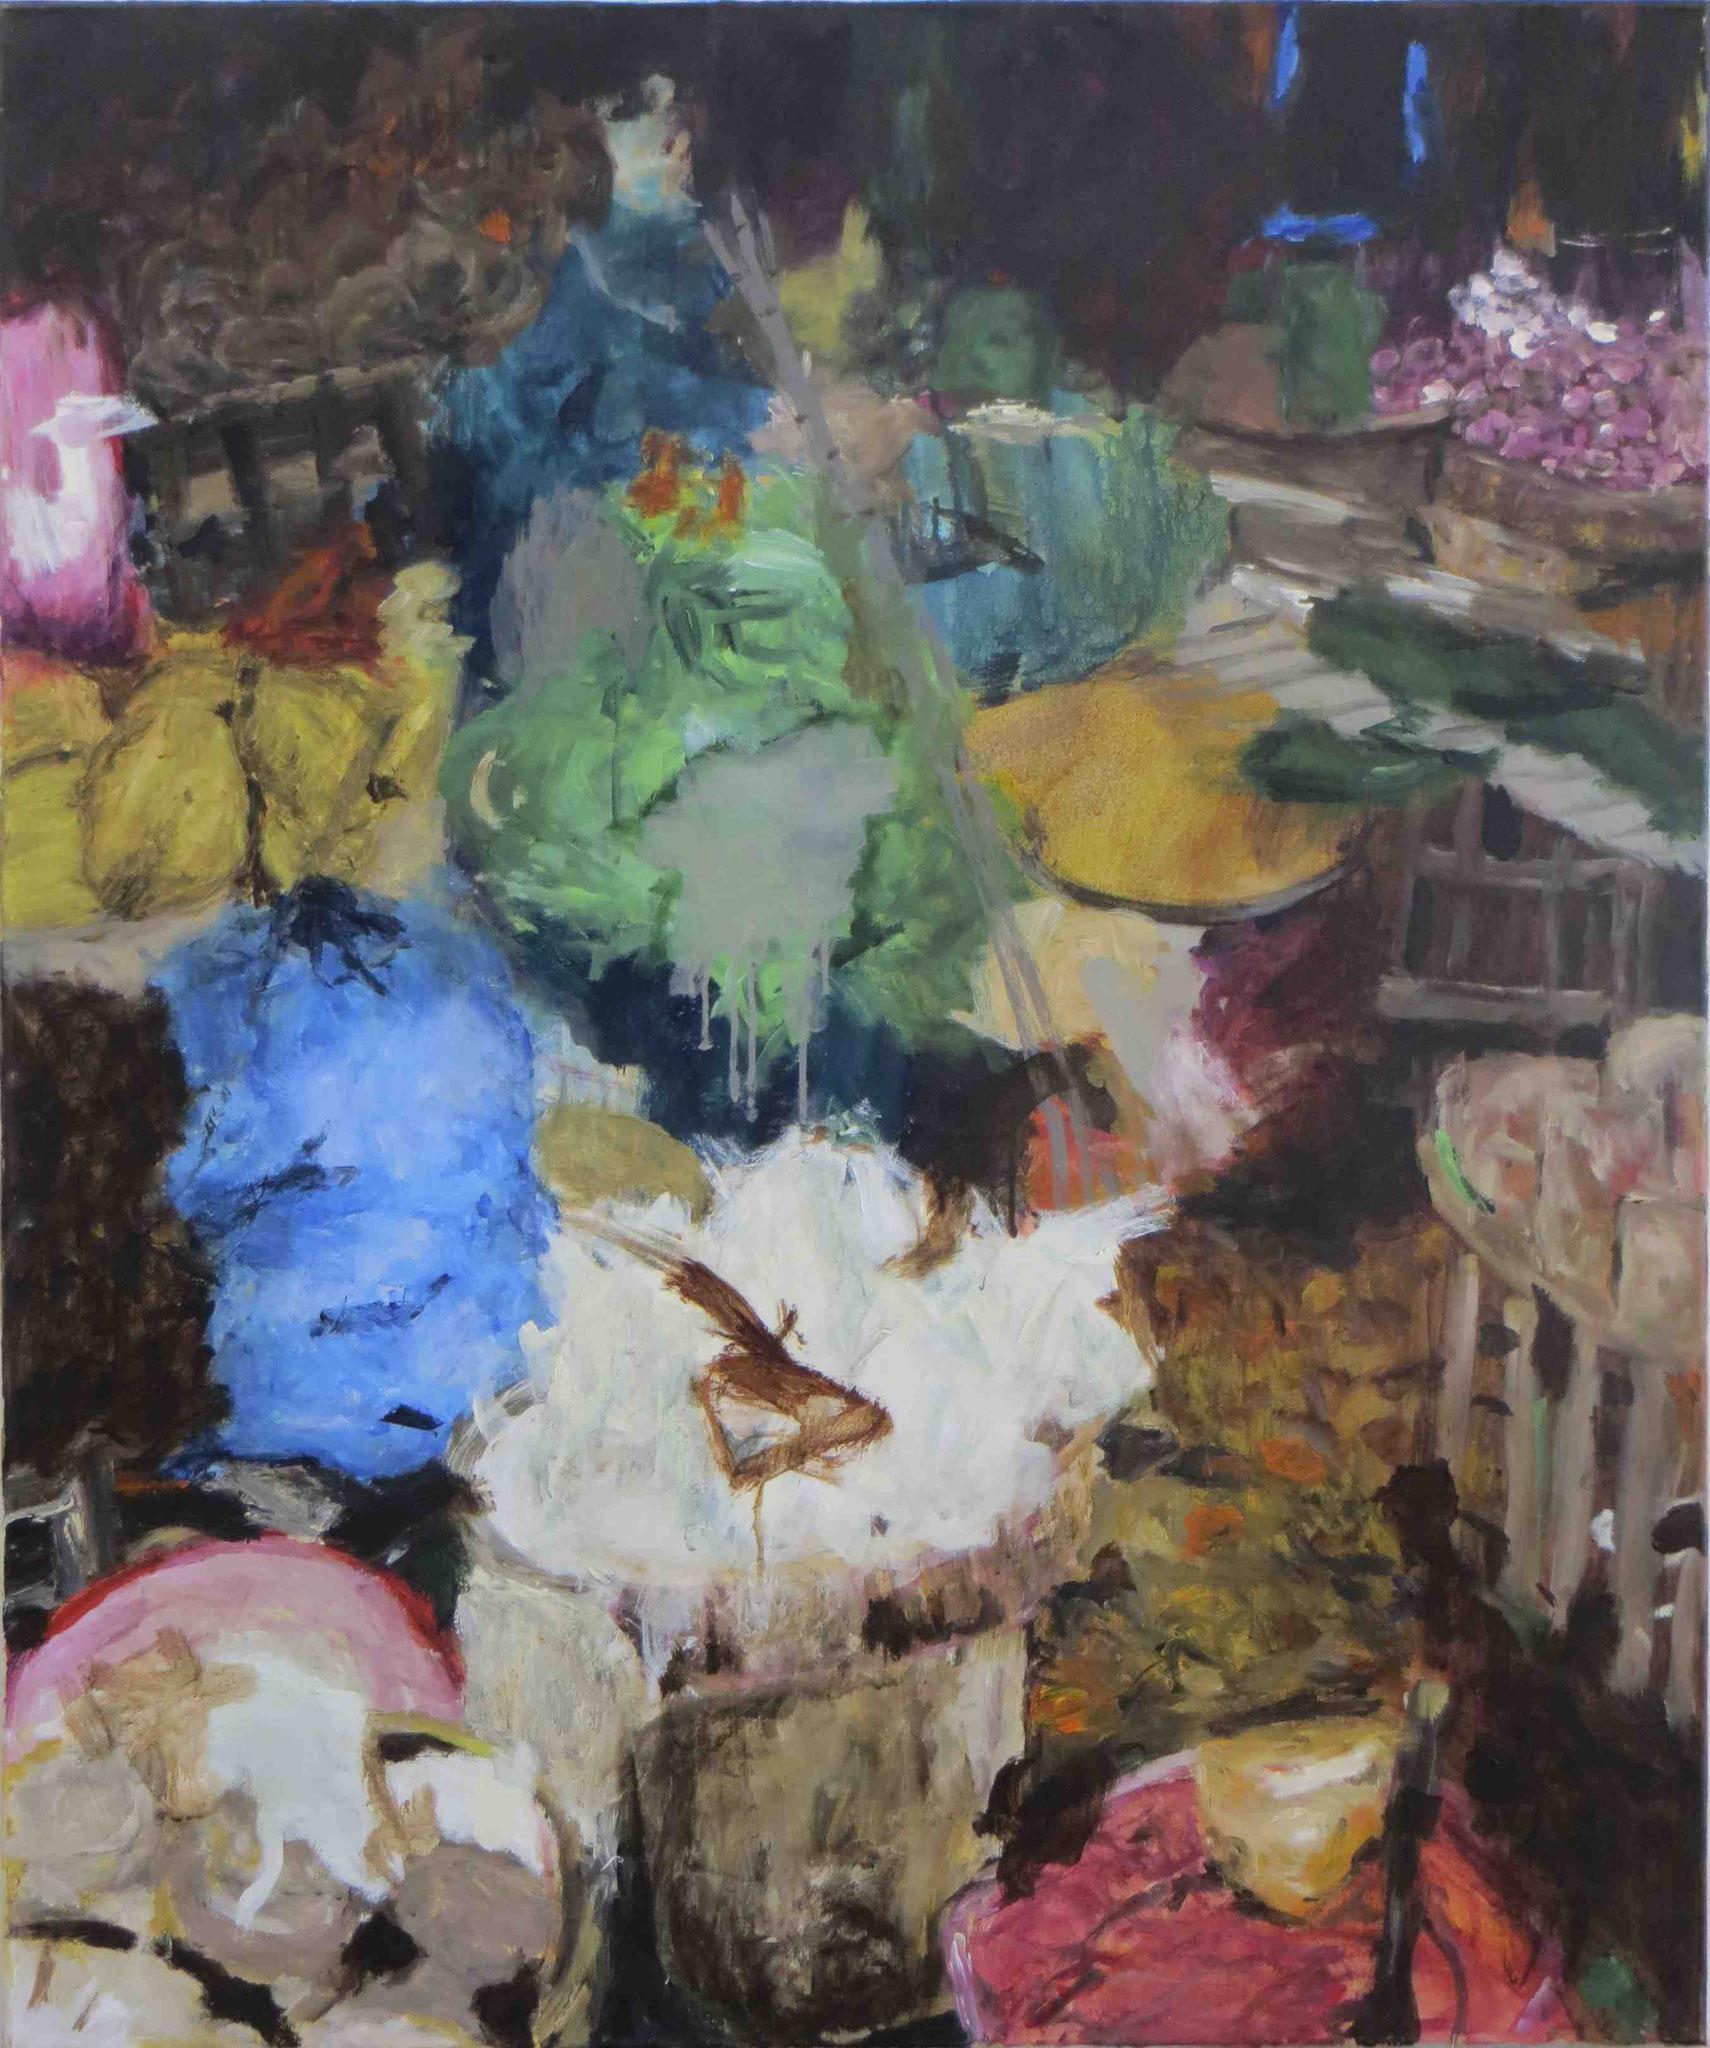 Morning Market Hué, Acryl auf Lwd, 120x100, 2012